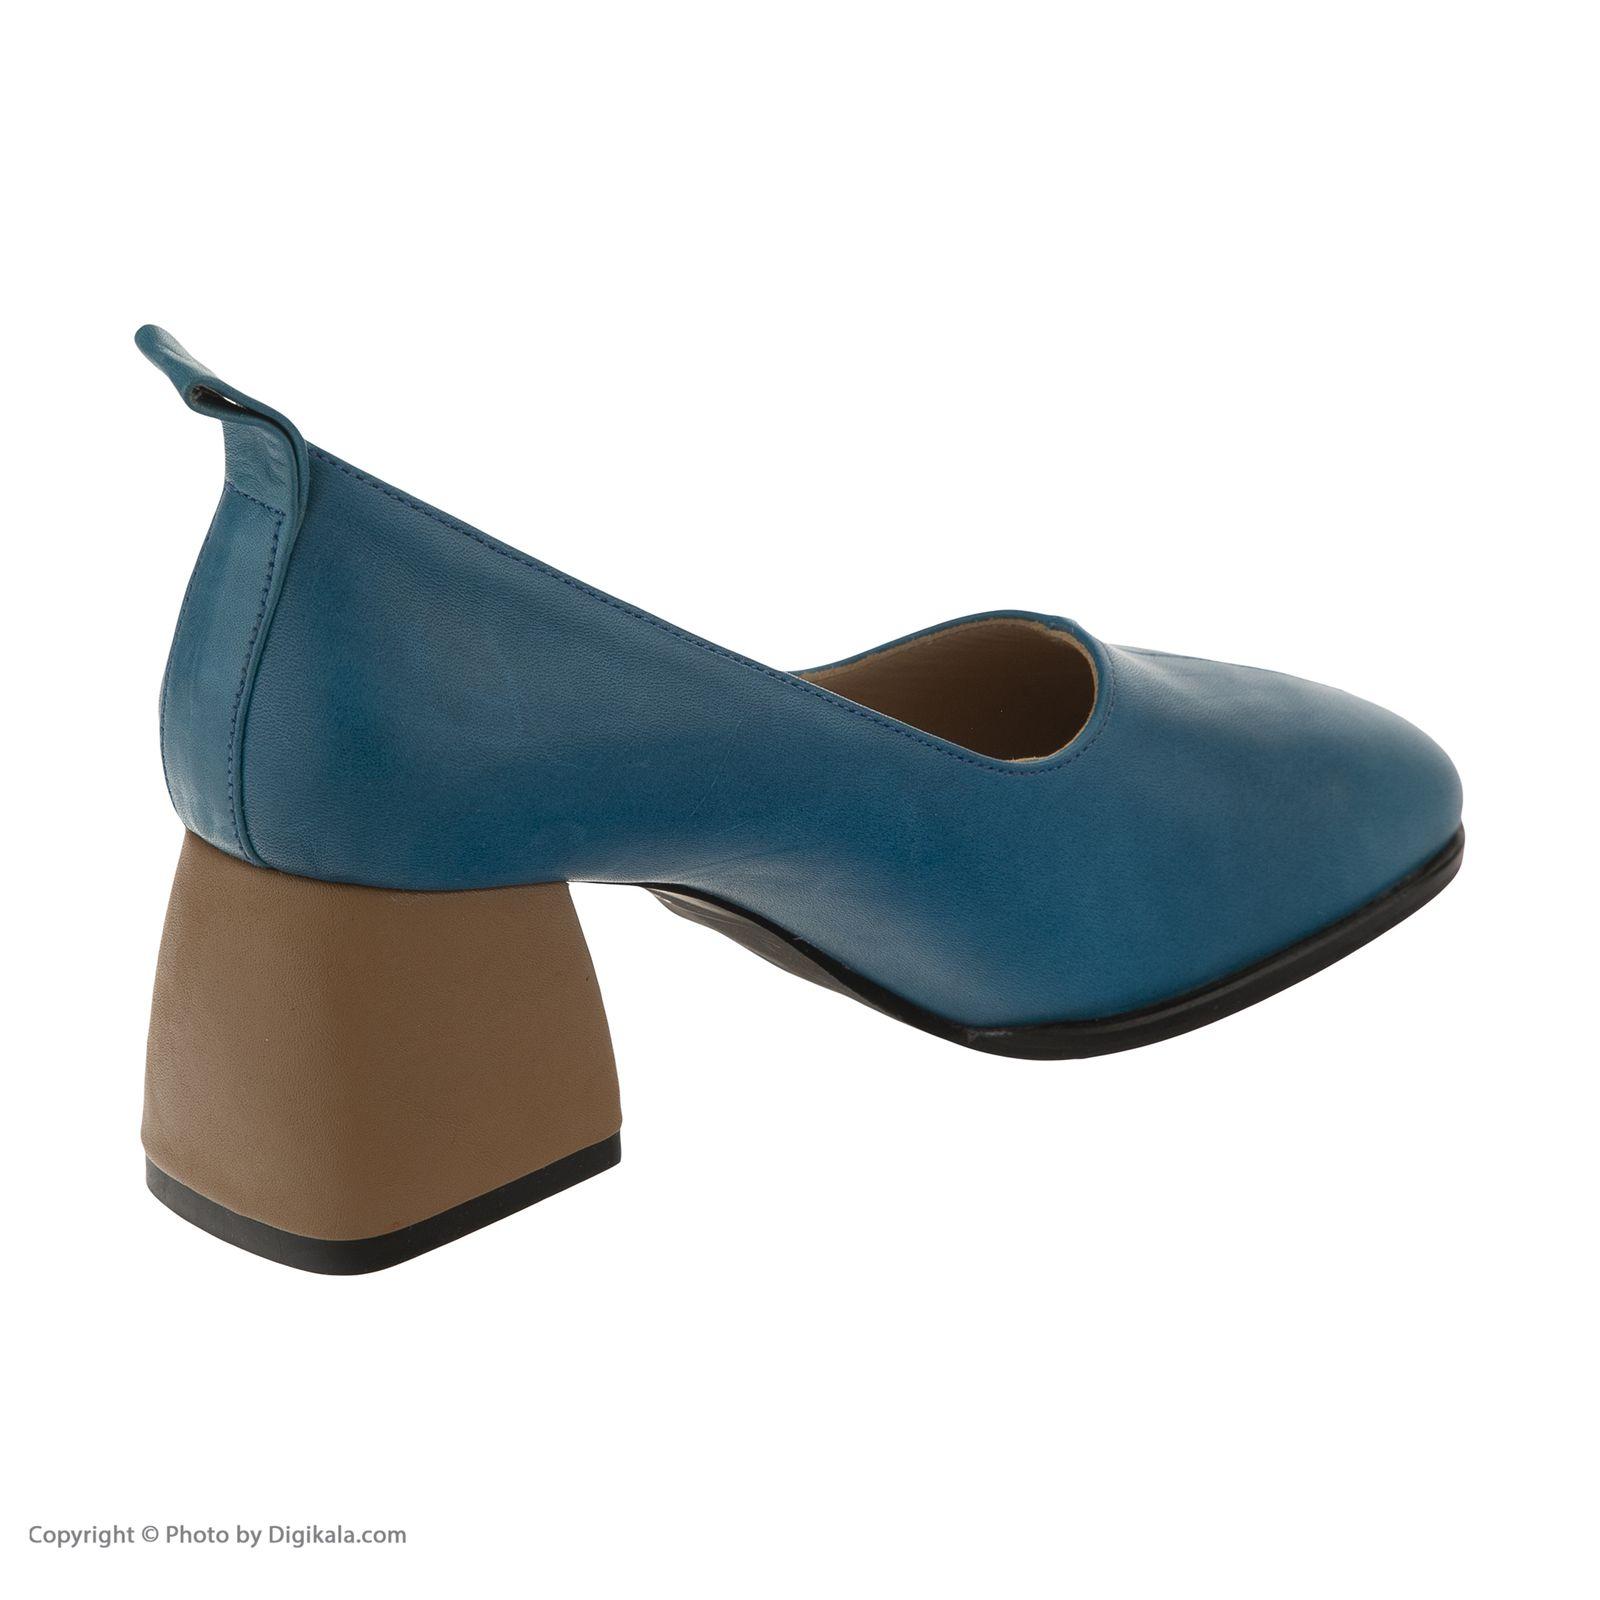 کفش زنانه آرتمن مدل leroy-42694-158 -  - 6